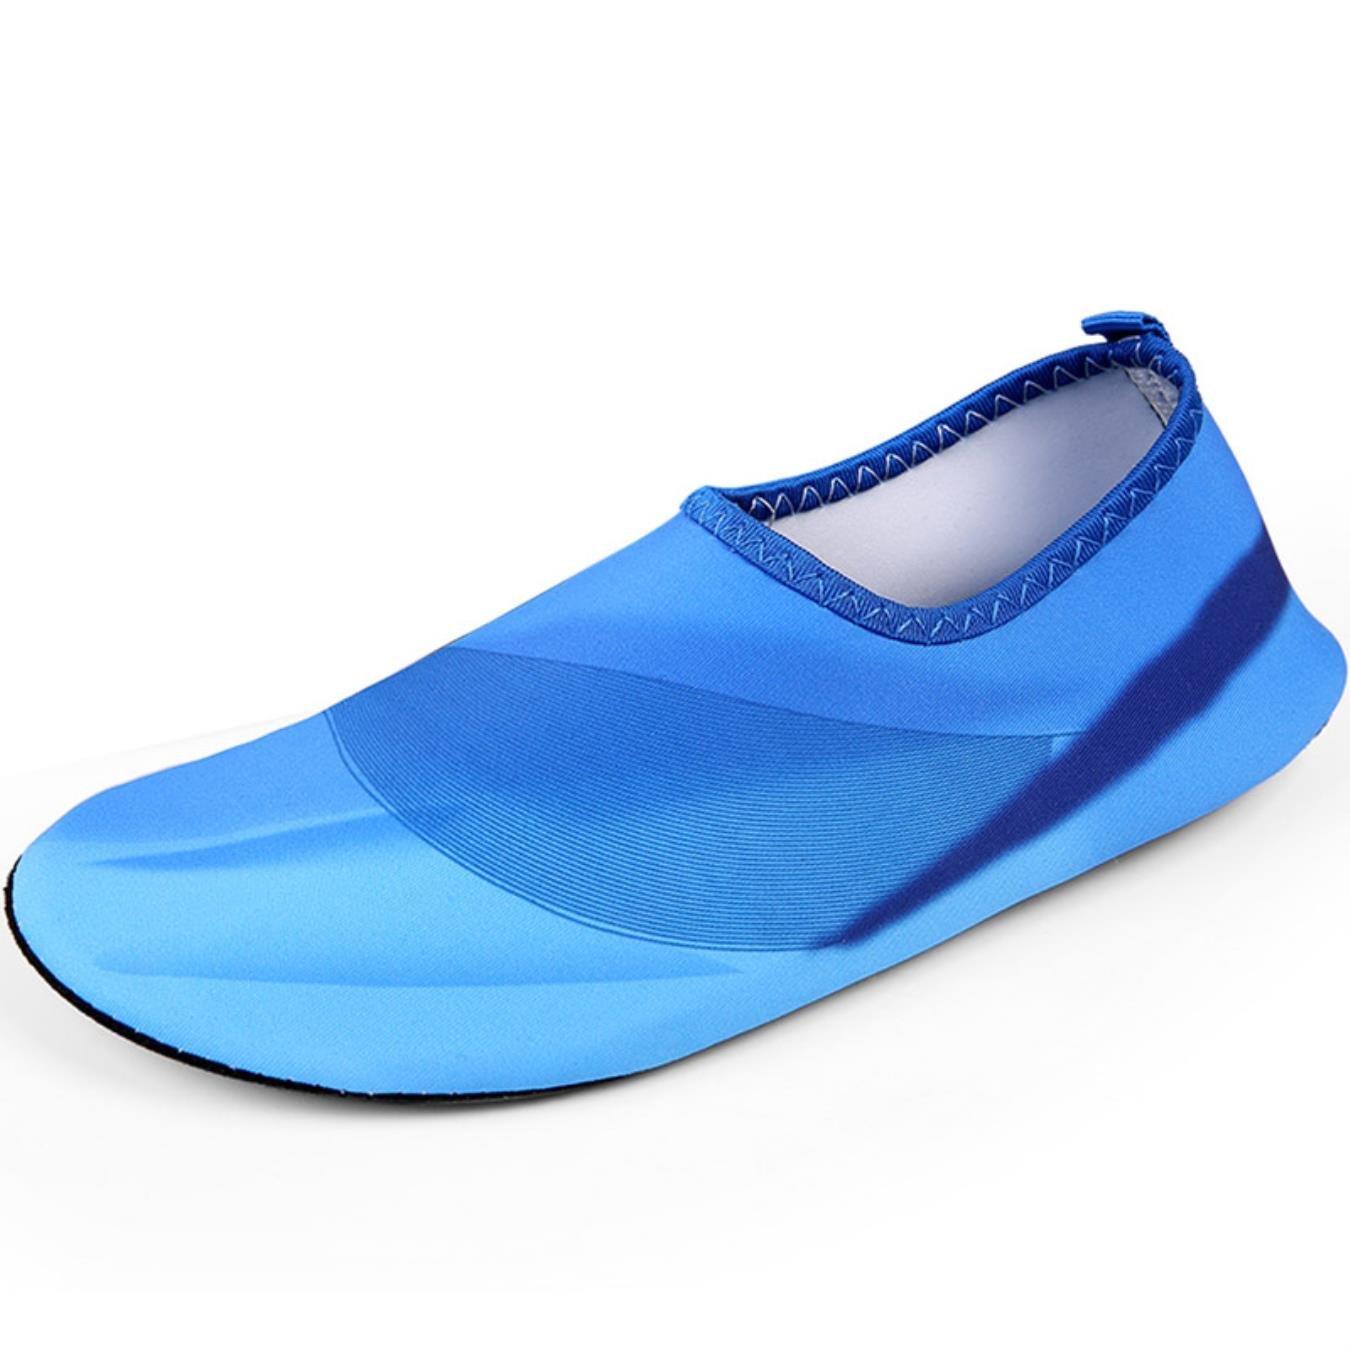 579485c045391 Amazon.com: Barefoot Shoes Women Sneaker Shoes for Beach Water ...